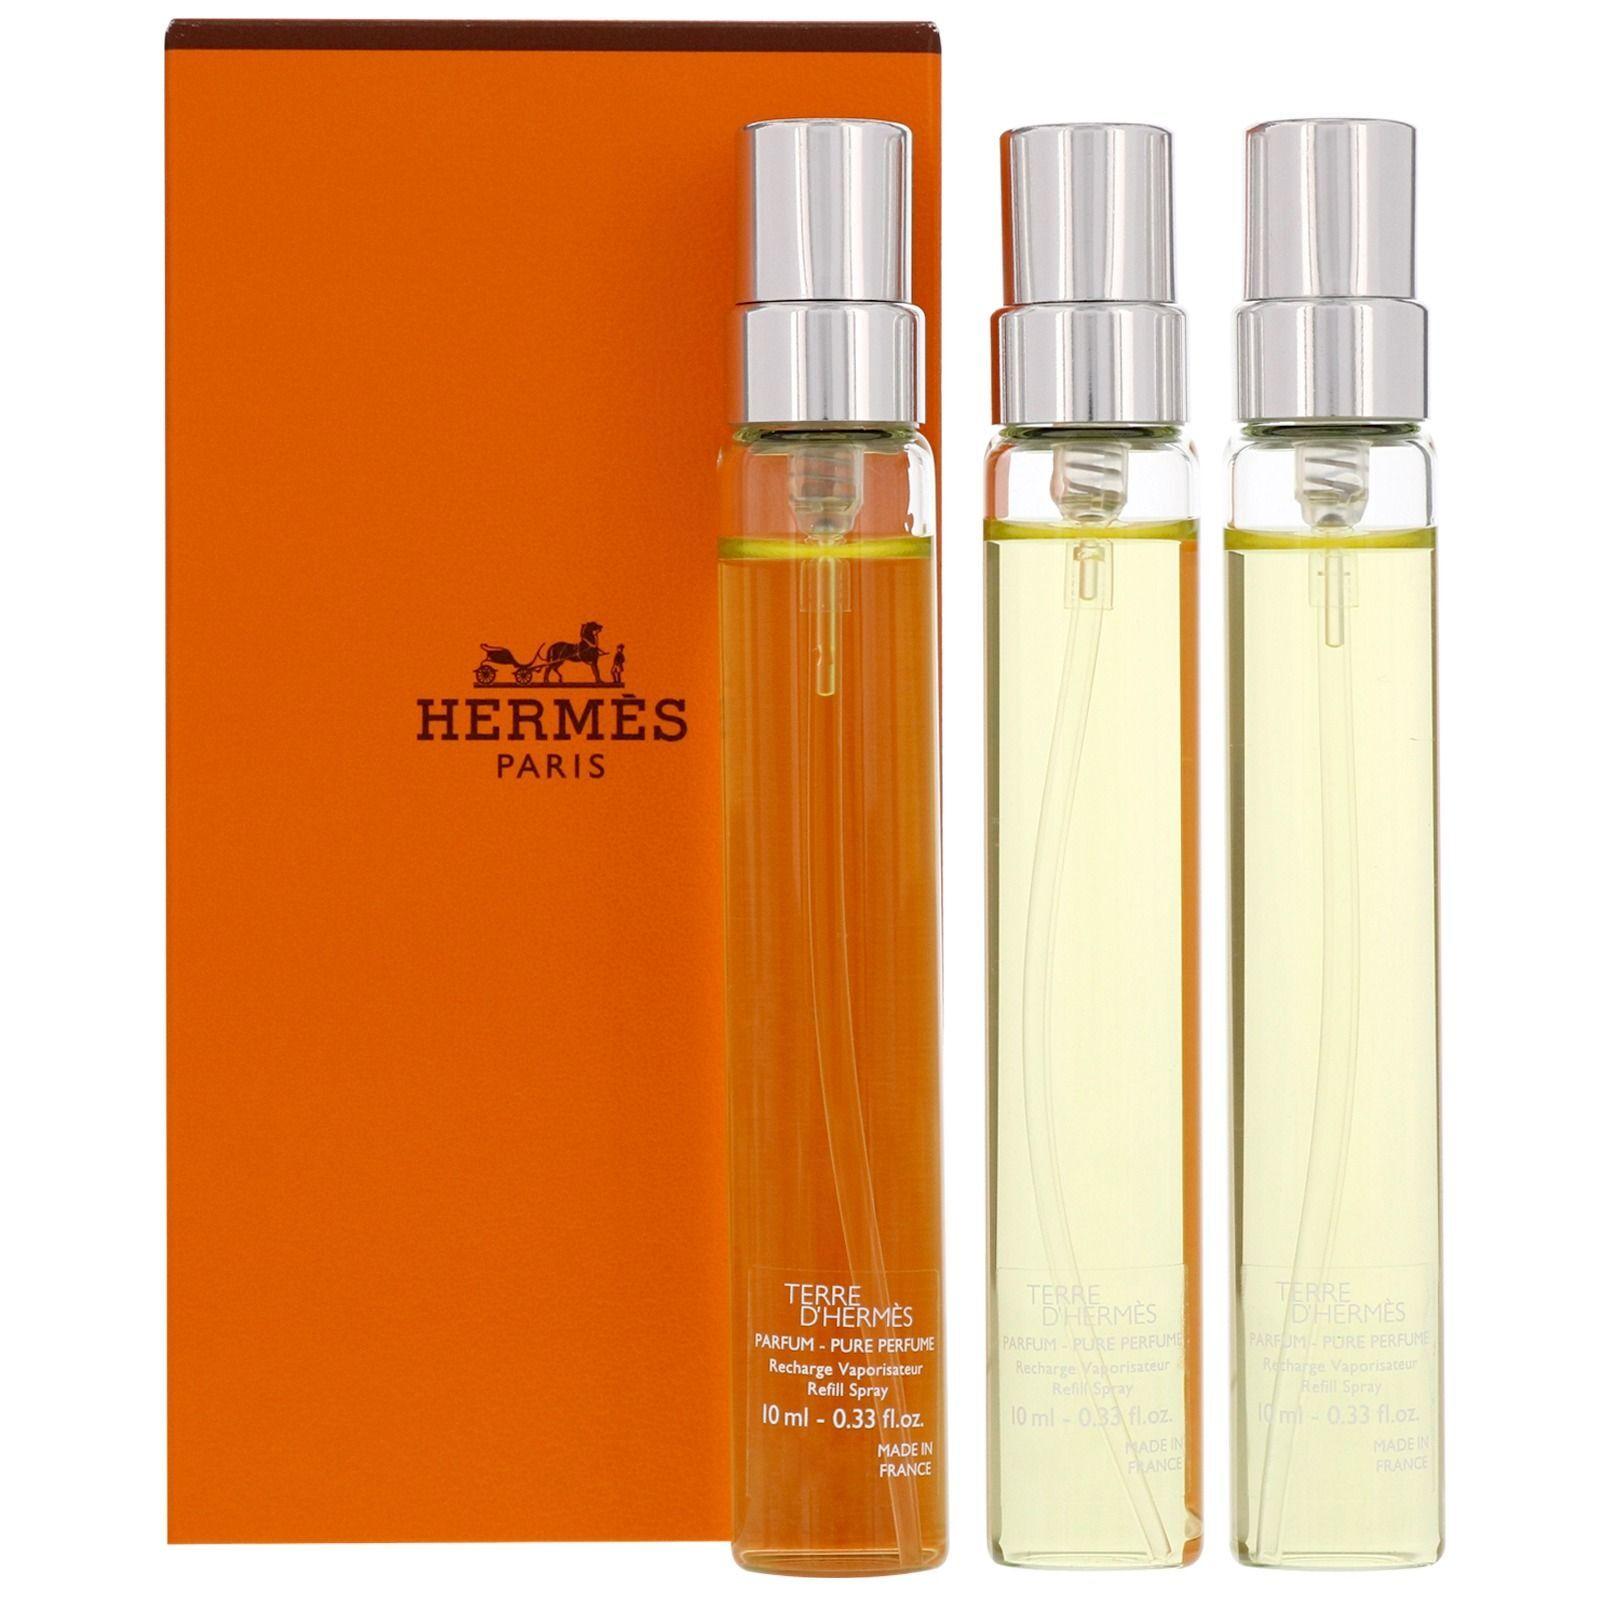 Hermes - Terre D'Hermes Eau de Parfum Spray Refills 3 x 10ml for Men